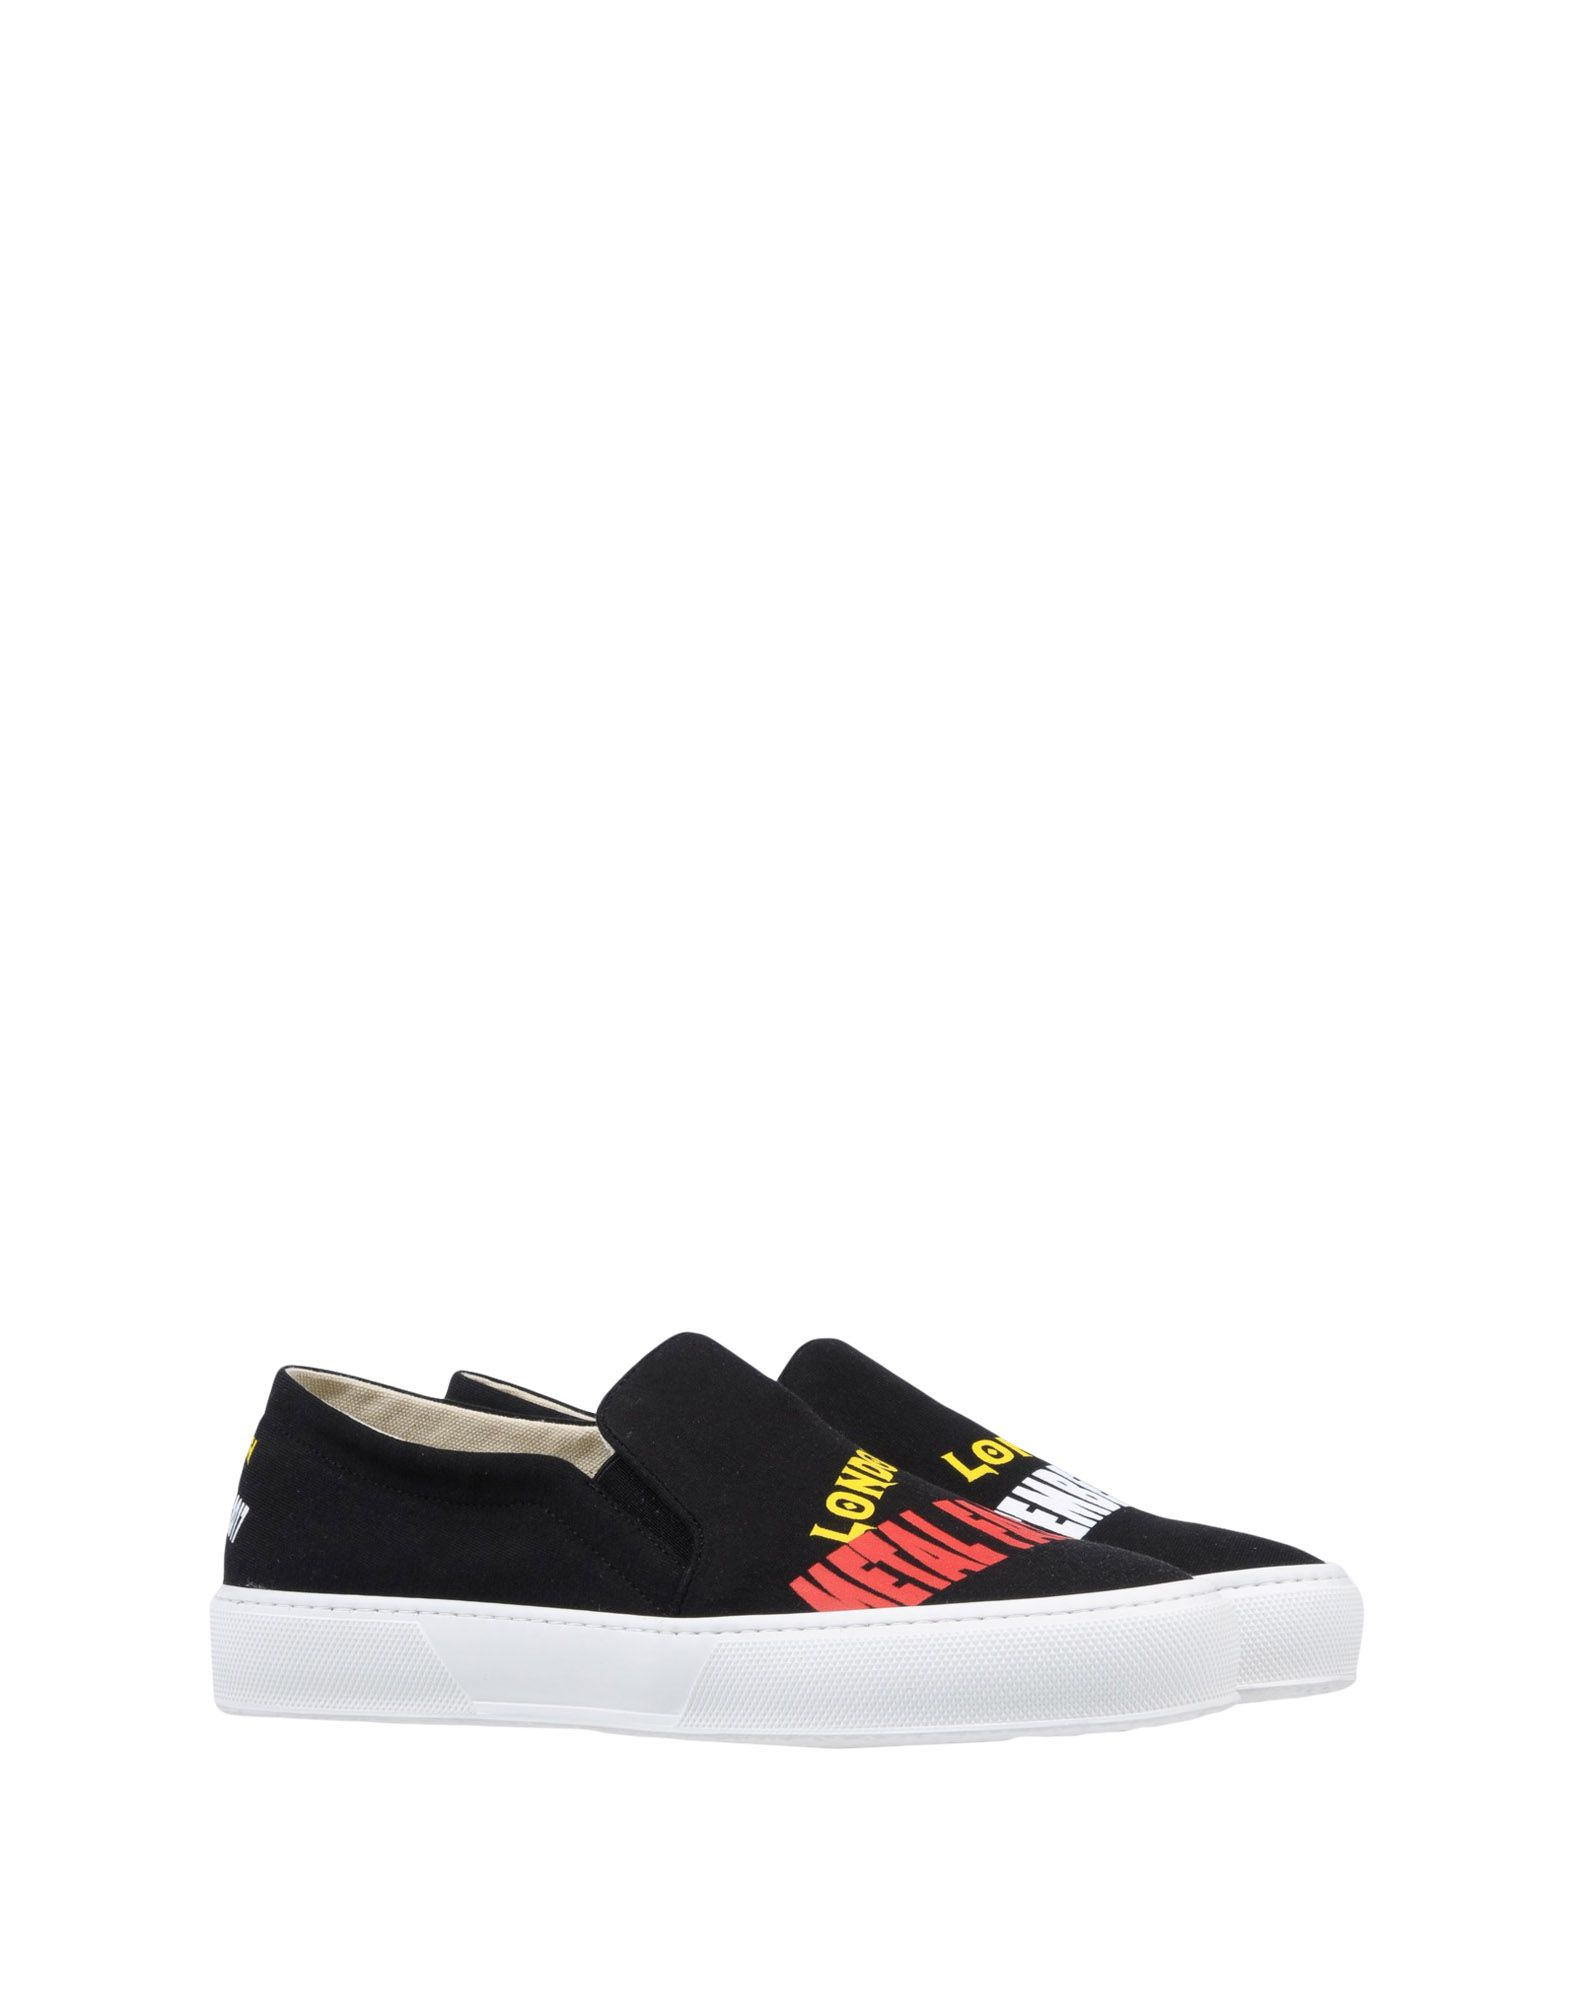 Joshua*S Sneakers Herren  11519817XL Gute Qualität beliebte Schuhe